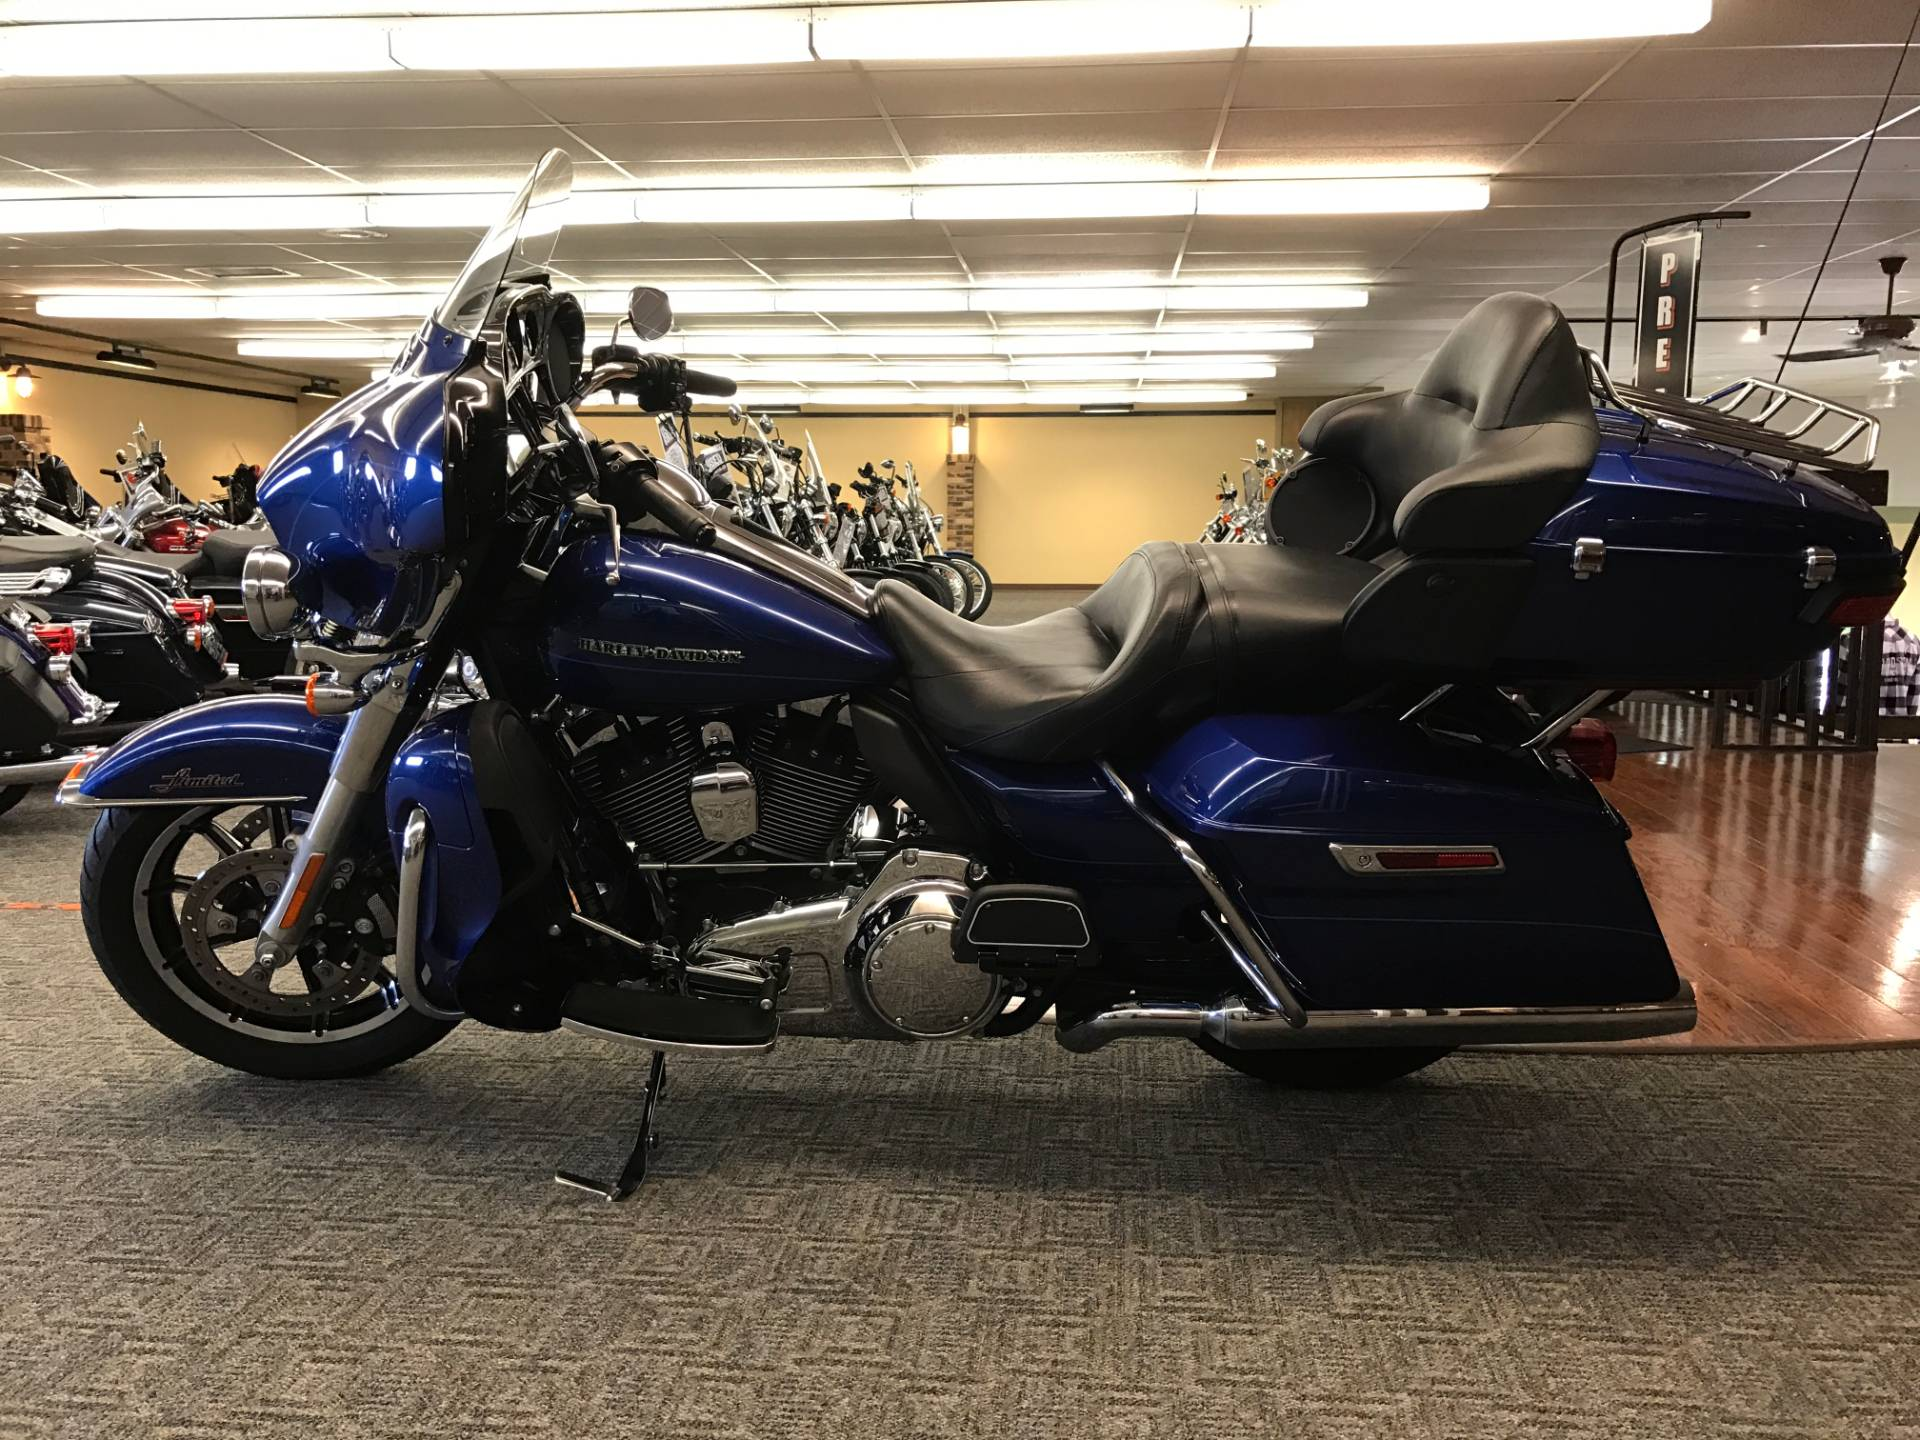 2015 Harley-Davidson Ultra Limited in Fort Wayne, Indiana